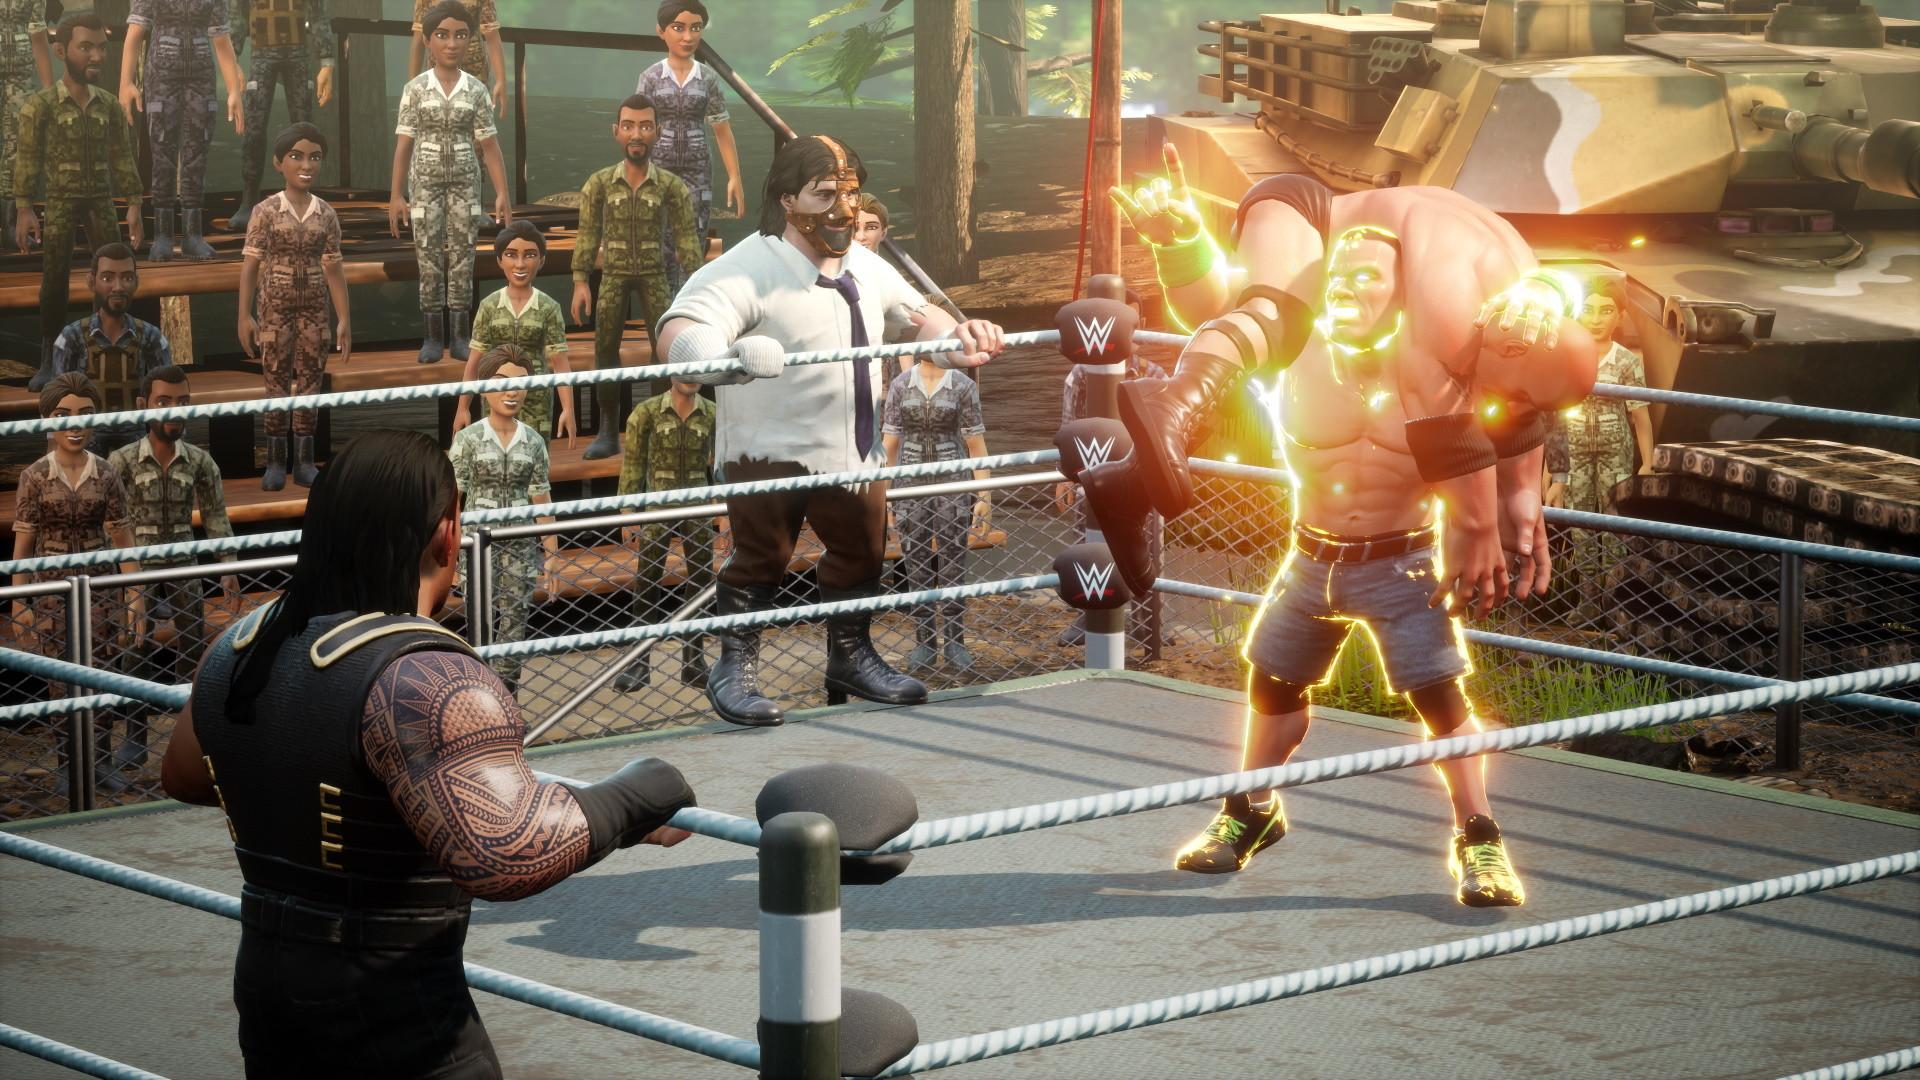 Save 60% on WWE 2K BATTLEGROUNDS on Steam